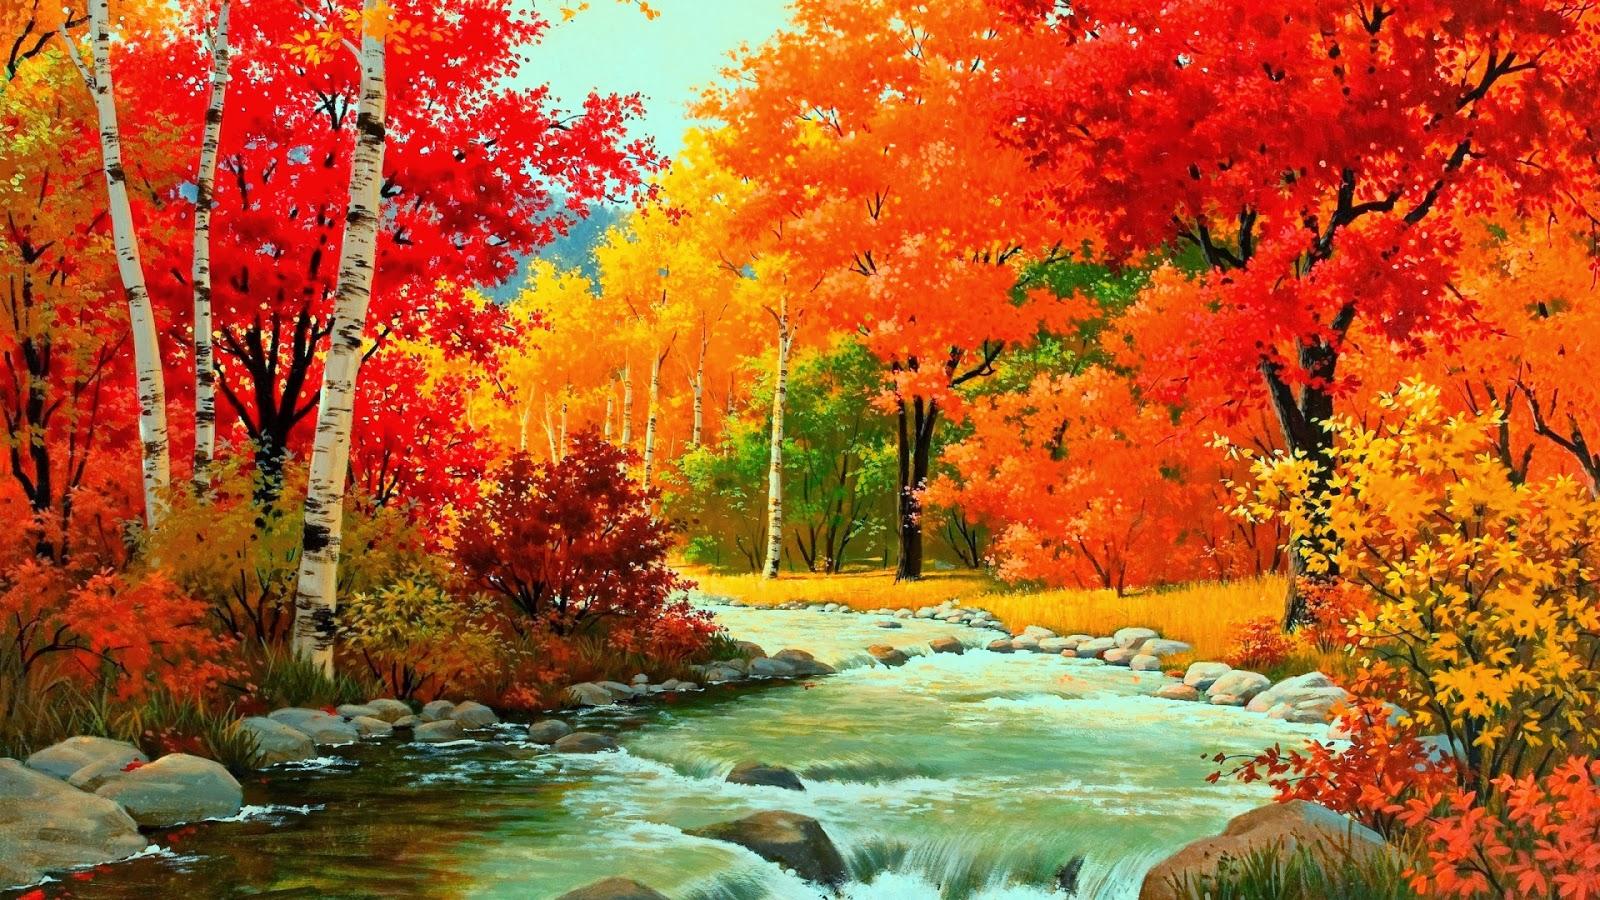 autumn nature river - photo #19